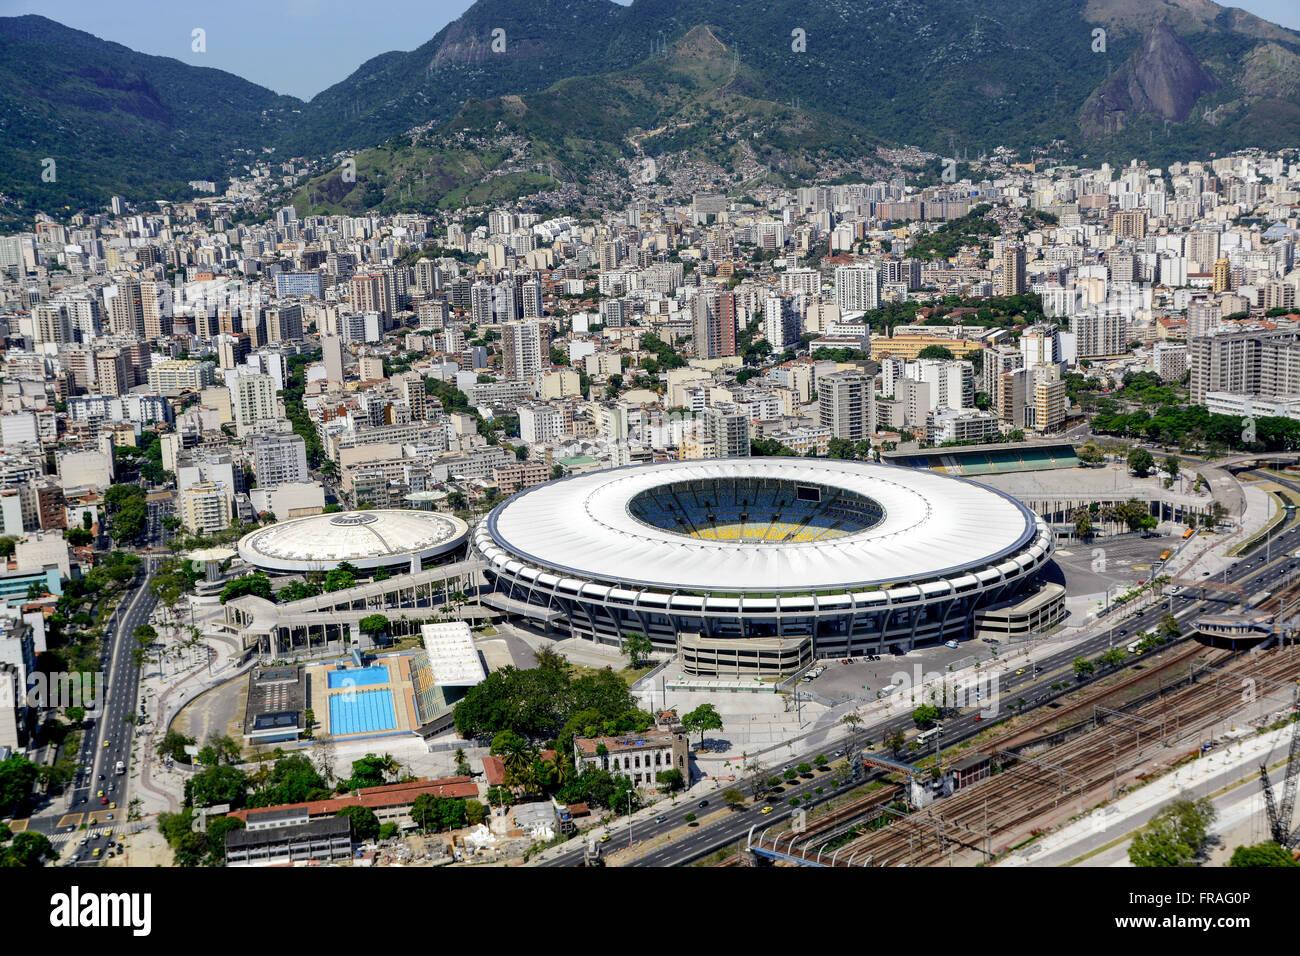 Maracana Sports Complex - Maracana stadiums, Maracanazinho and watery Julio Delamare - Stock Image